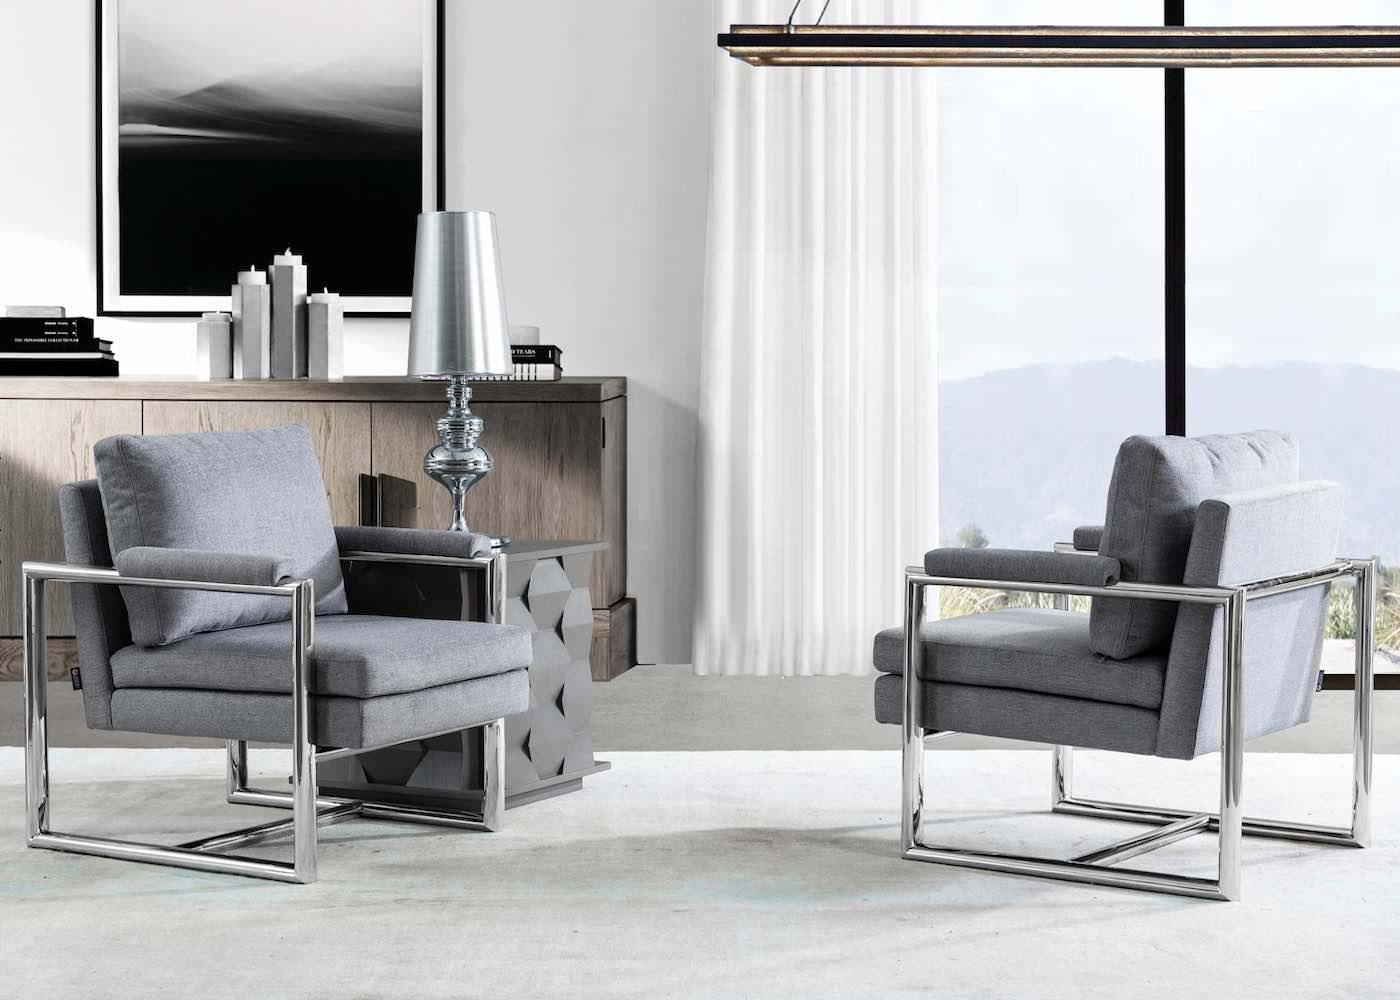 mazarin-ameublement-catalogue-produits-chaise-fauteuil-20